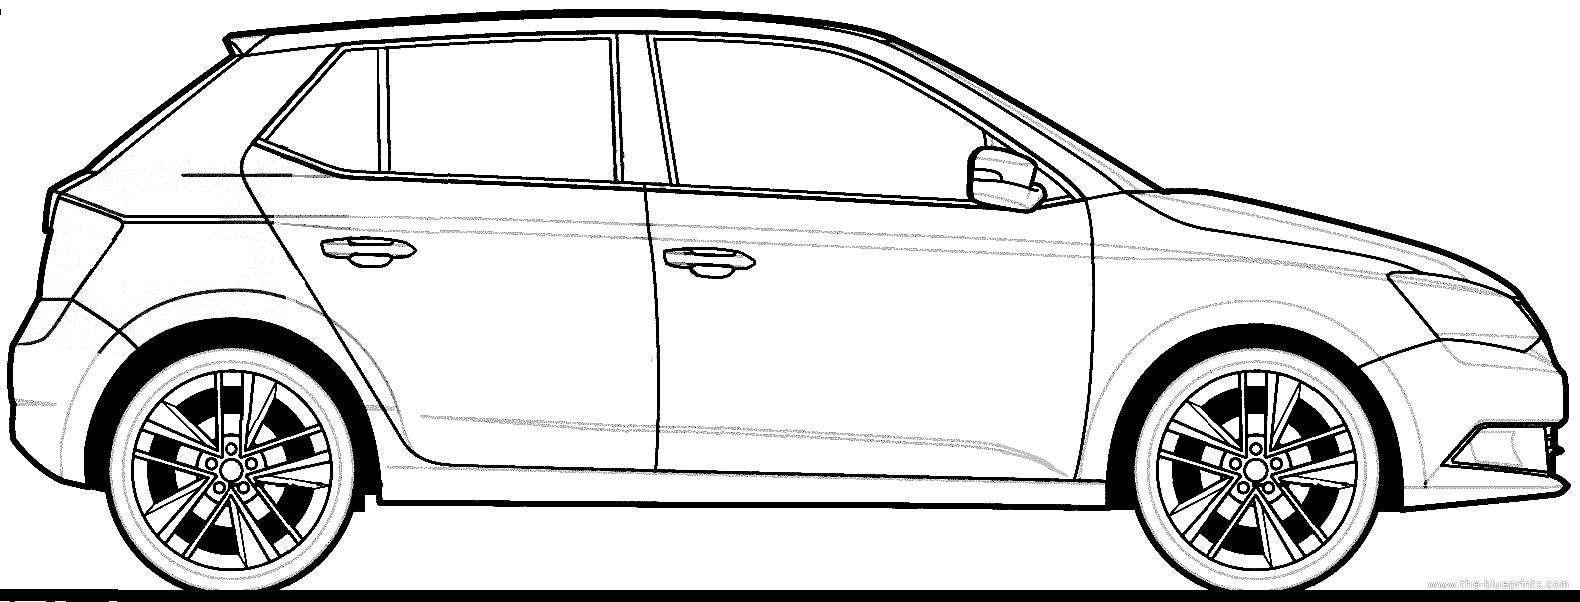 Blueprints > Cars > Skoda > Skoda Fabia 1.2 TSi (2015)